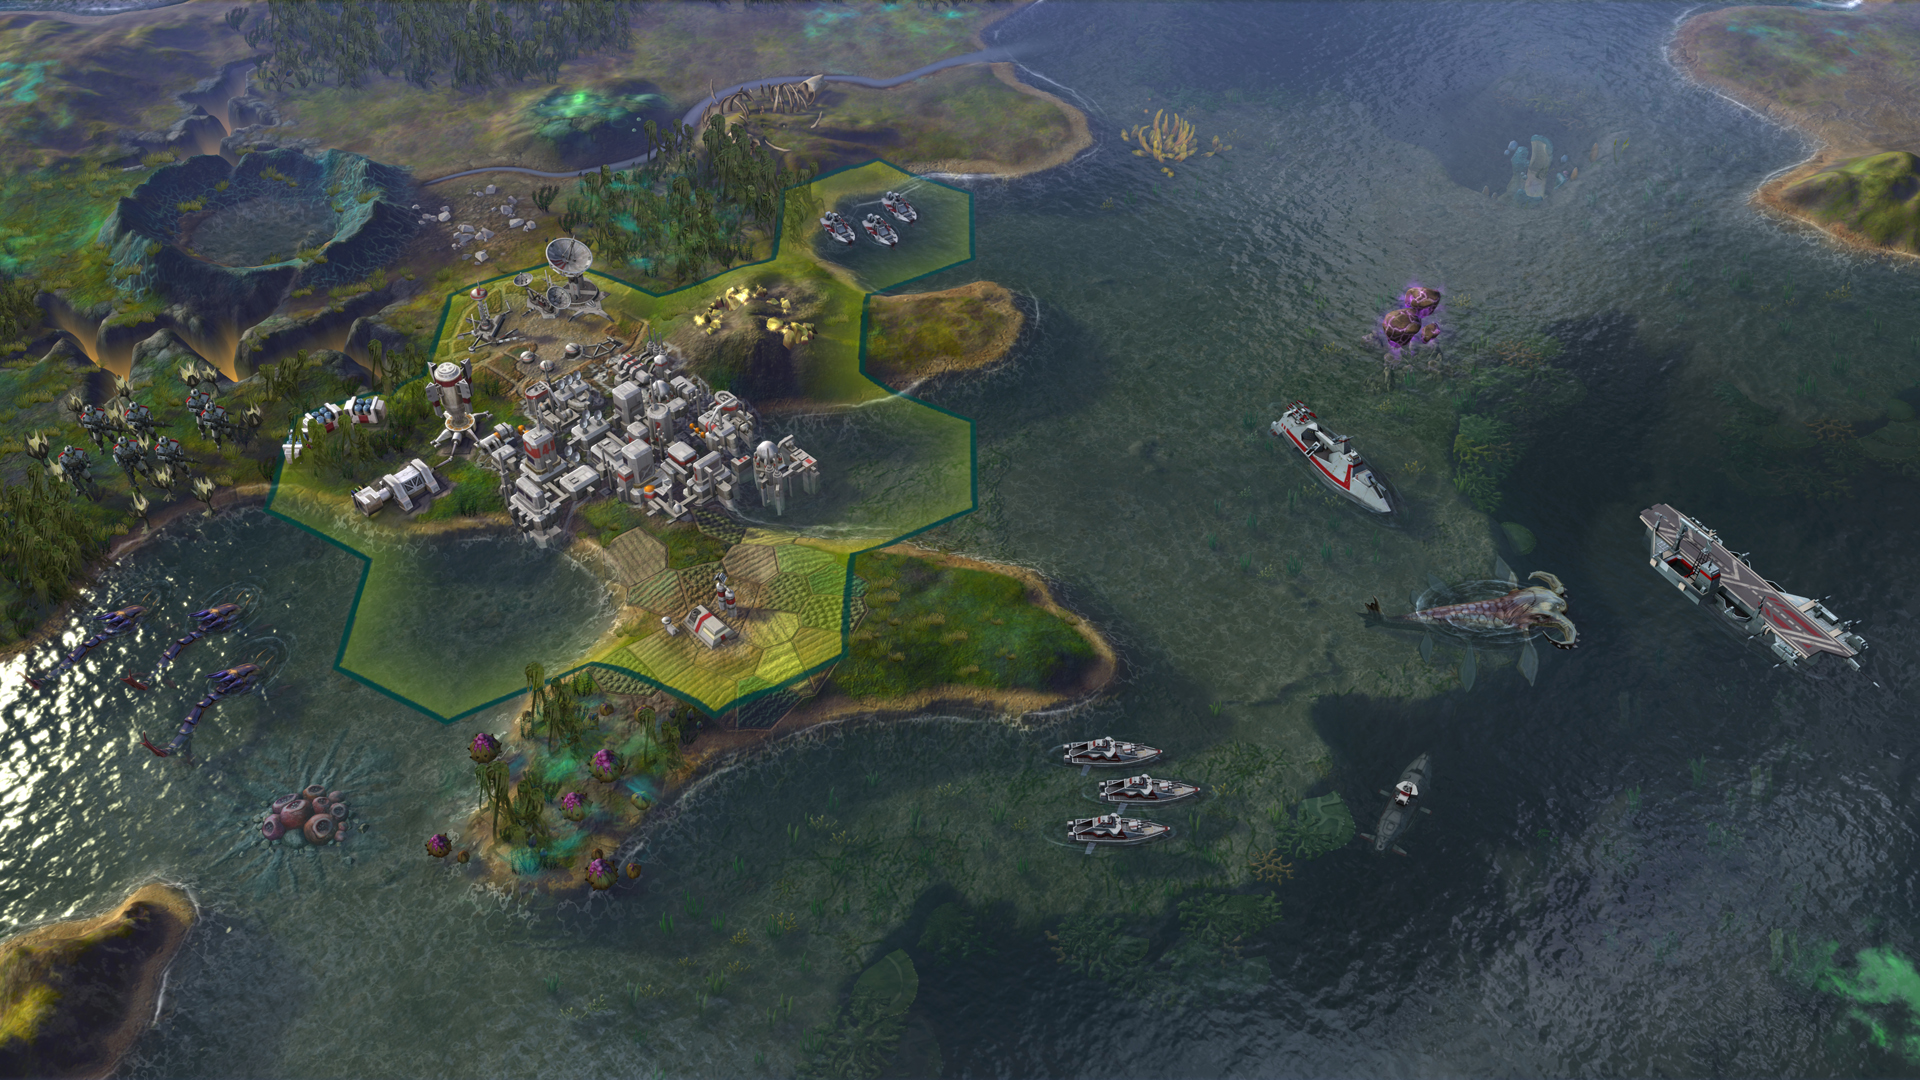 http://www.pcgames.de/screenshots/original/2015/05/Civilization_Beyond_EarthRising_Tide_1-pc-games.jpg